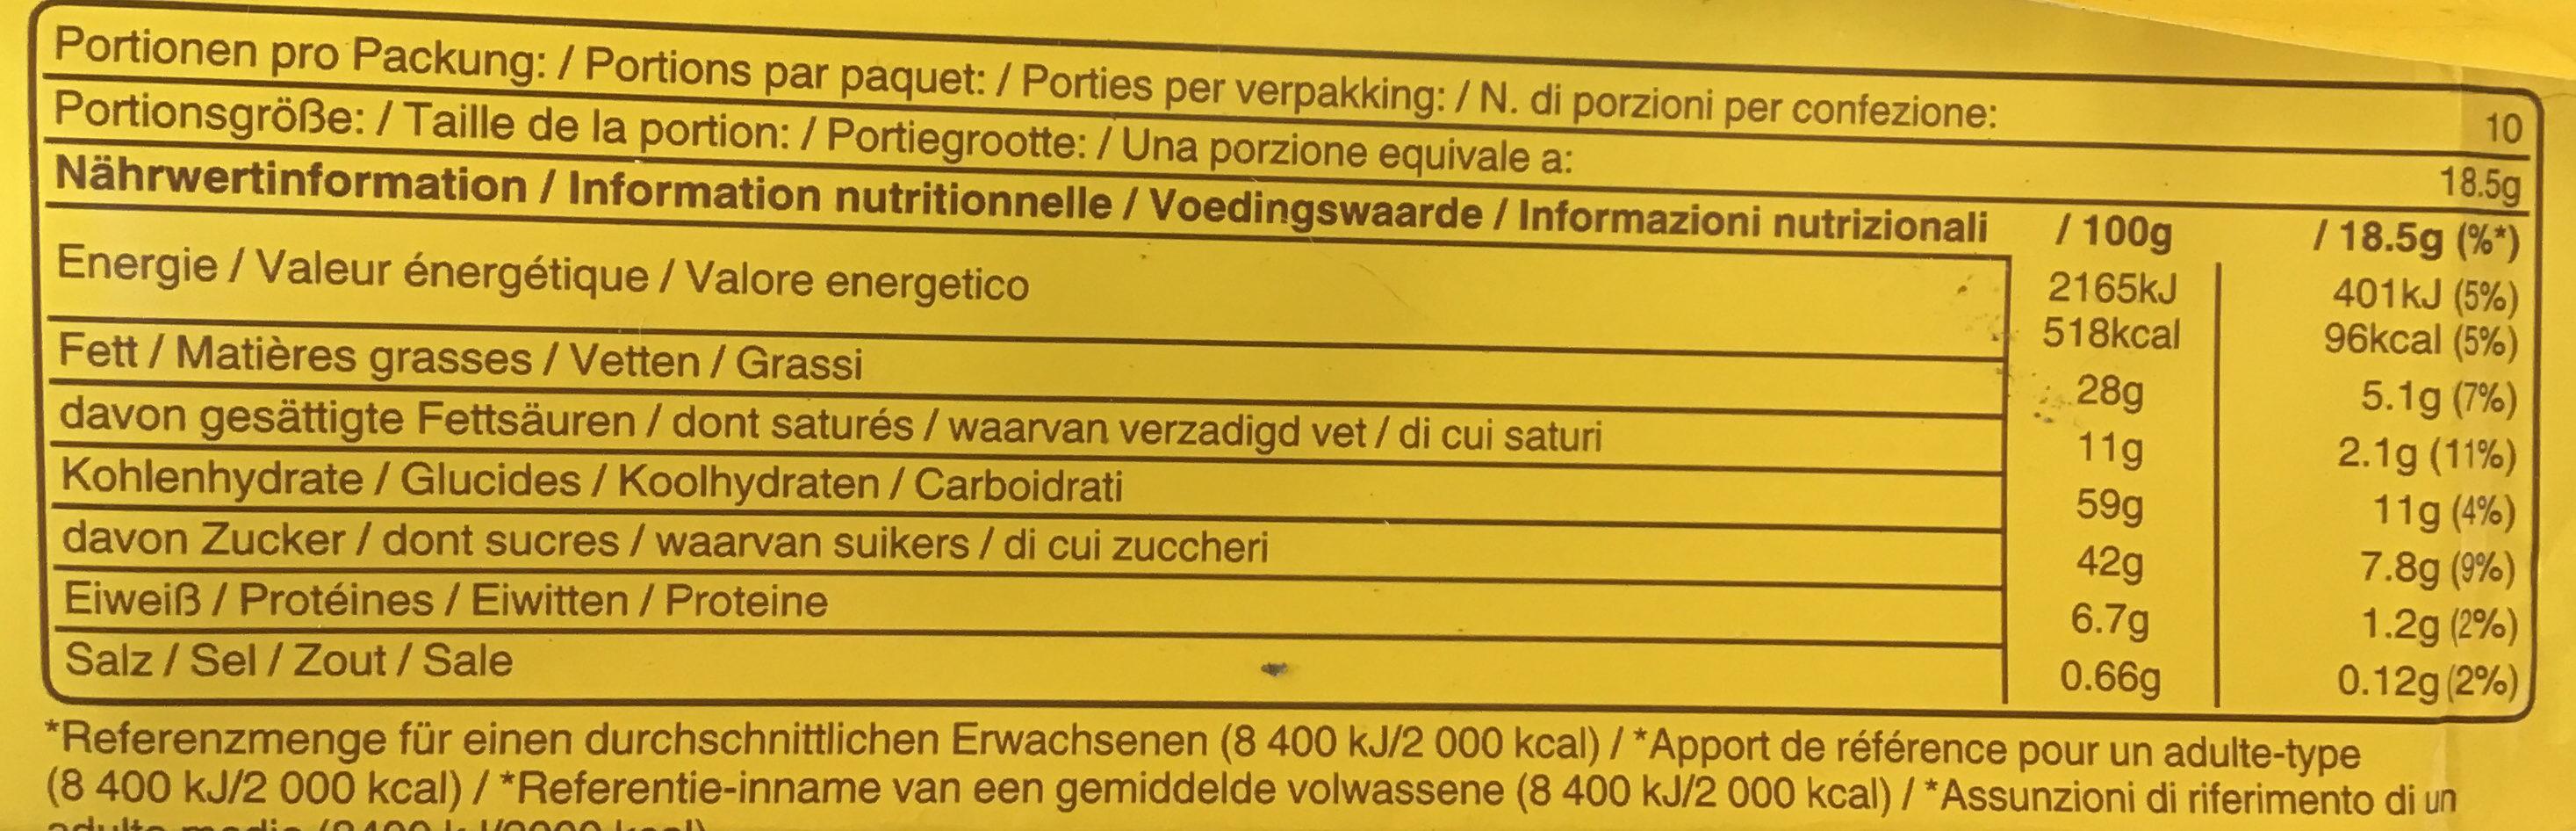 Miel amandes - Voedingswaarden - fr